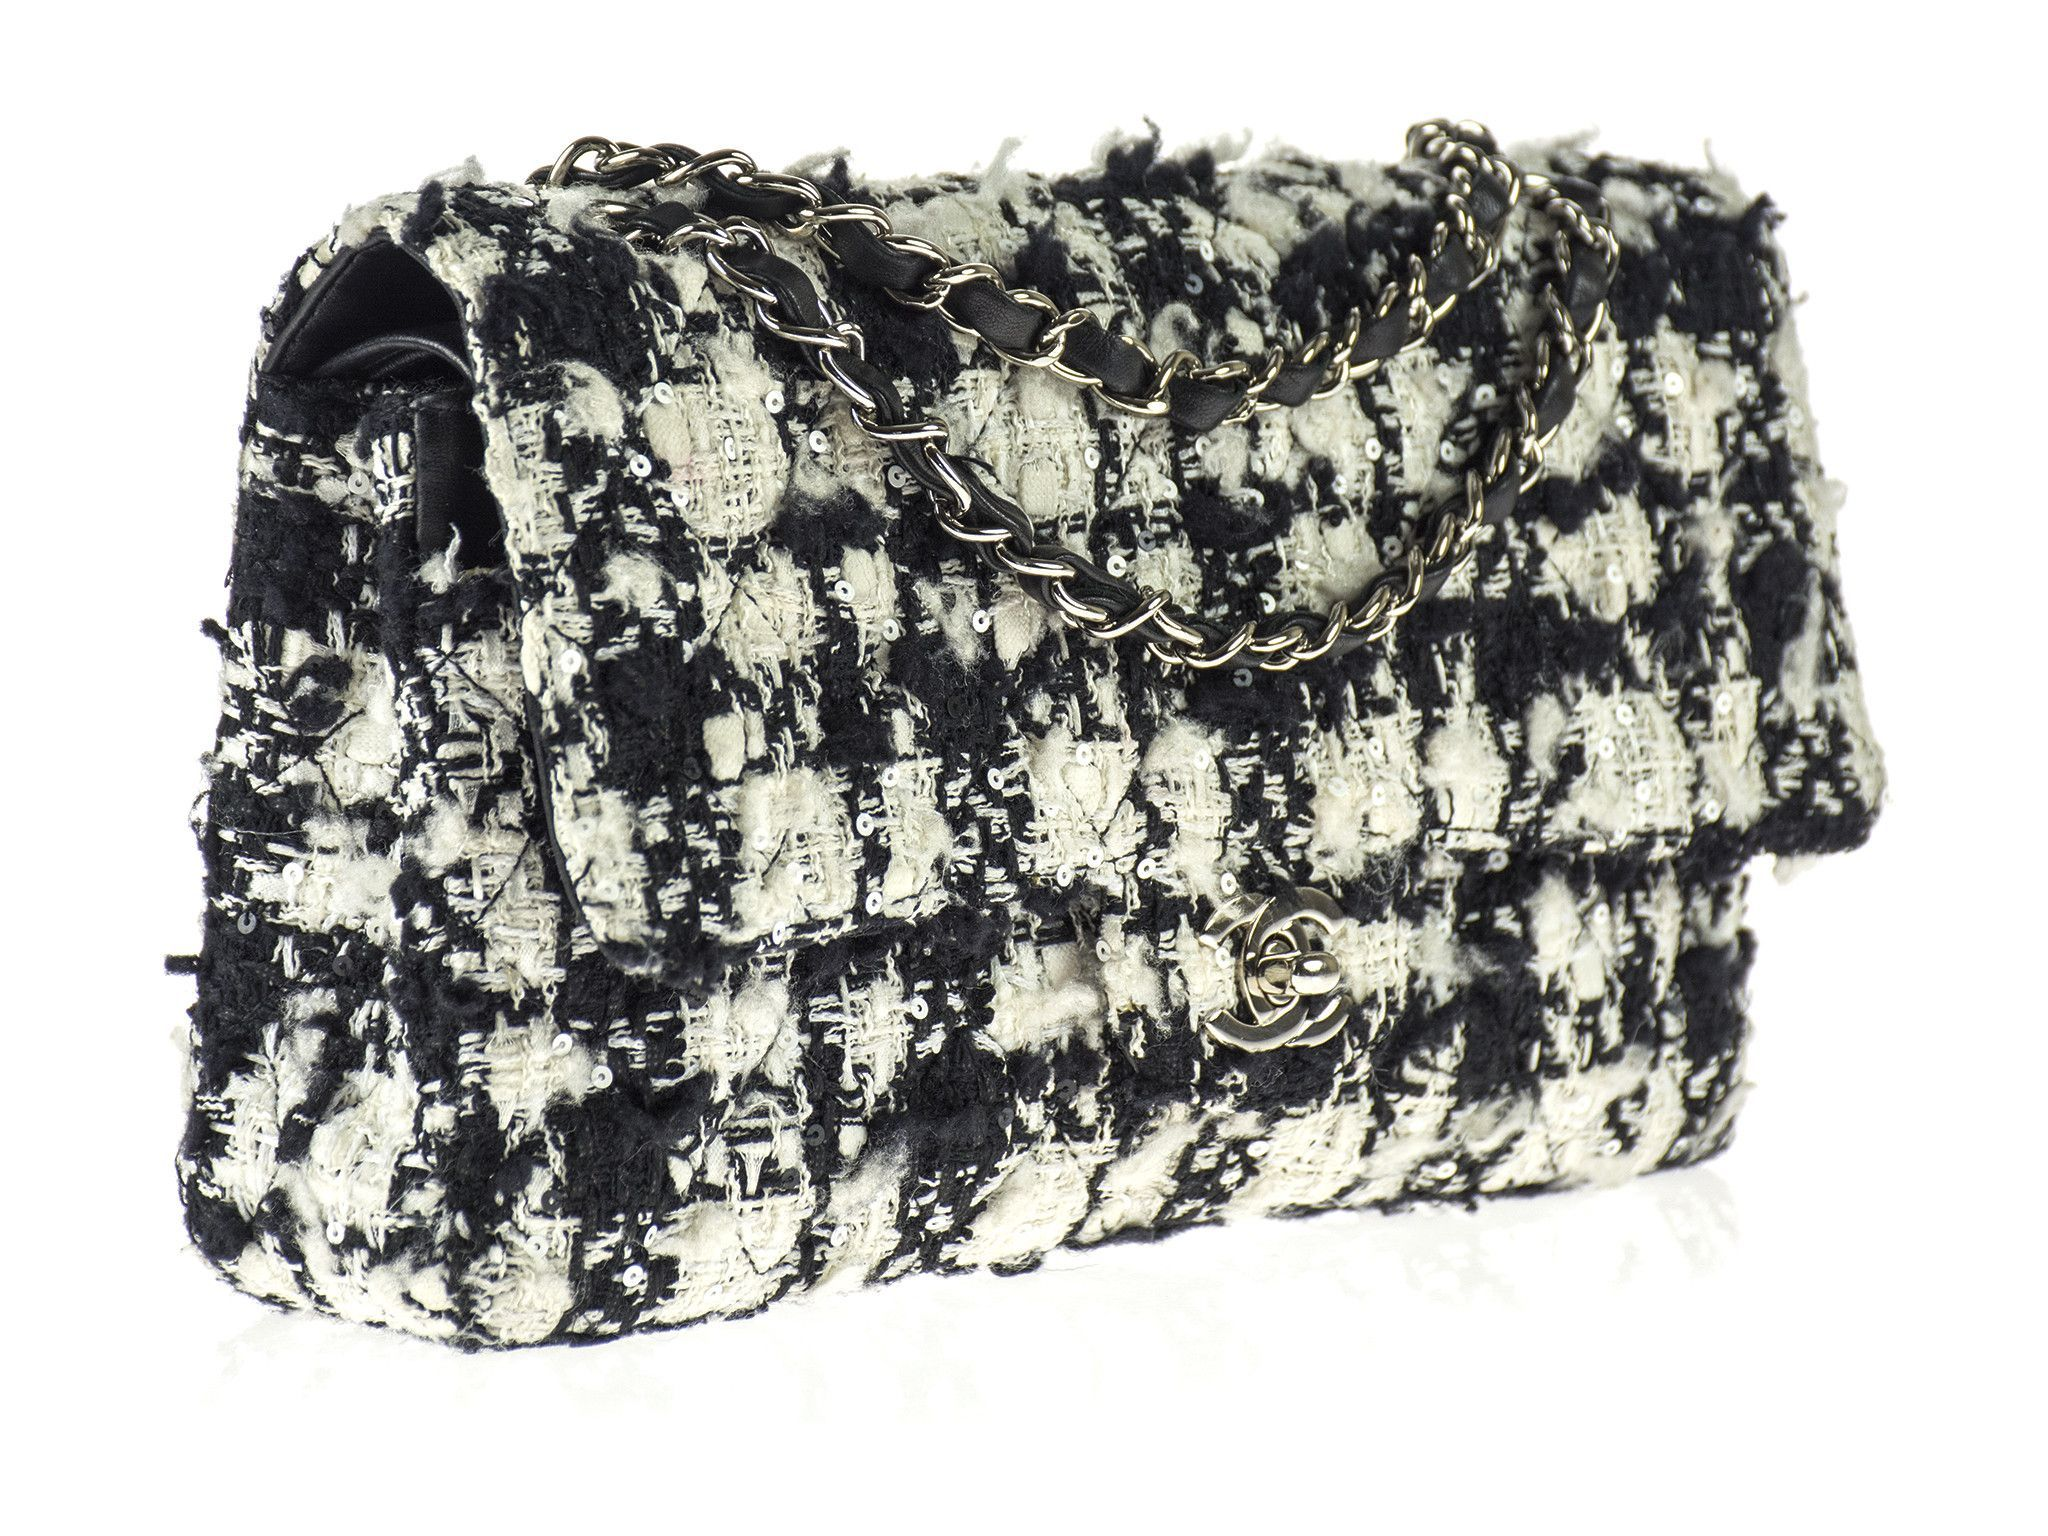 Chanel Black & White Tweed 2.55 Double Flap Bag